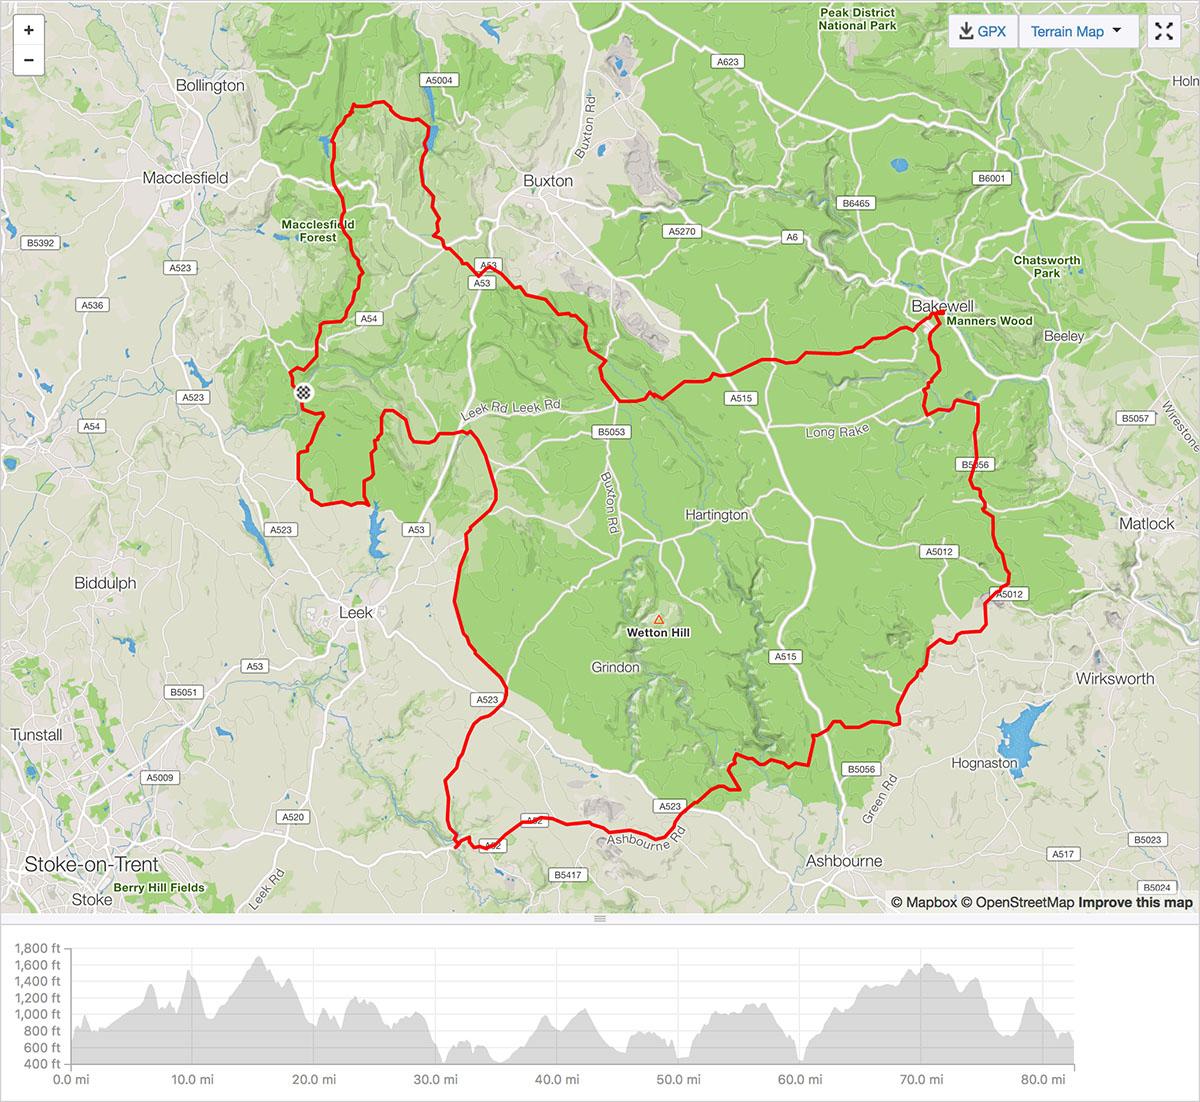 peak district epic club ride route